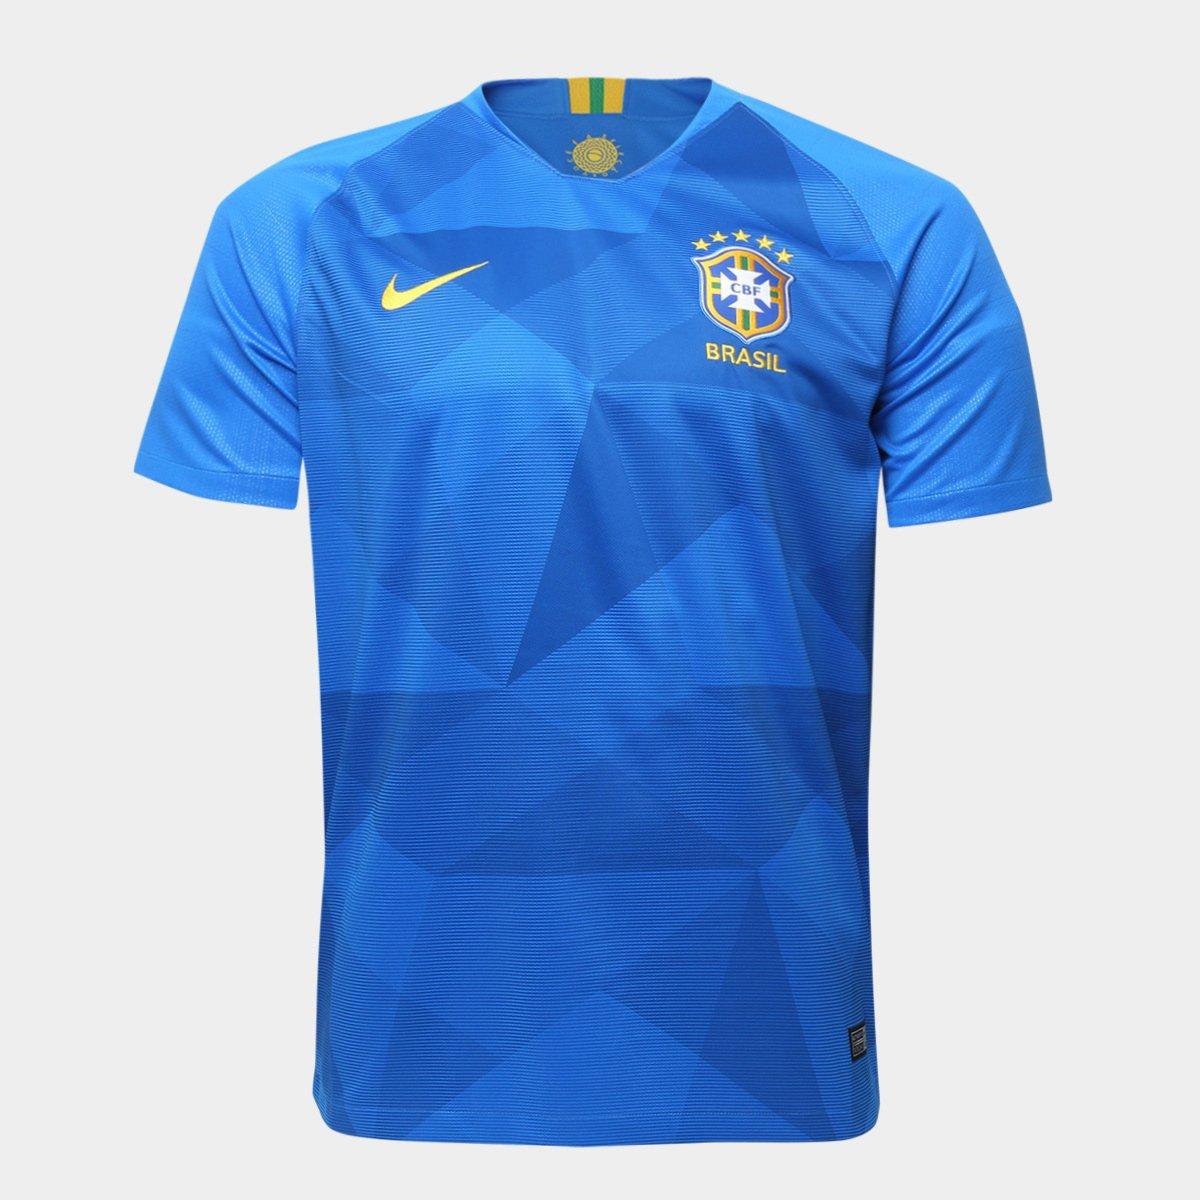 4c1f8f97b Camisa Seleção Brasil II 2018 s n° - Torcedor Nike Masculina - Azul -  Compre Agora